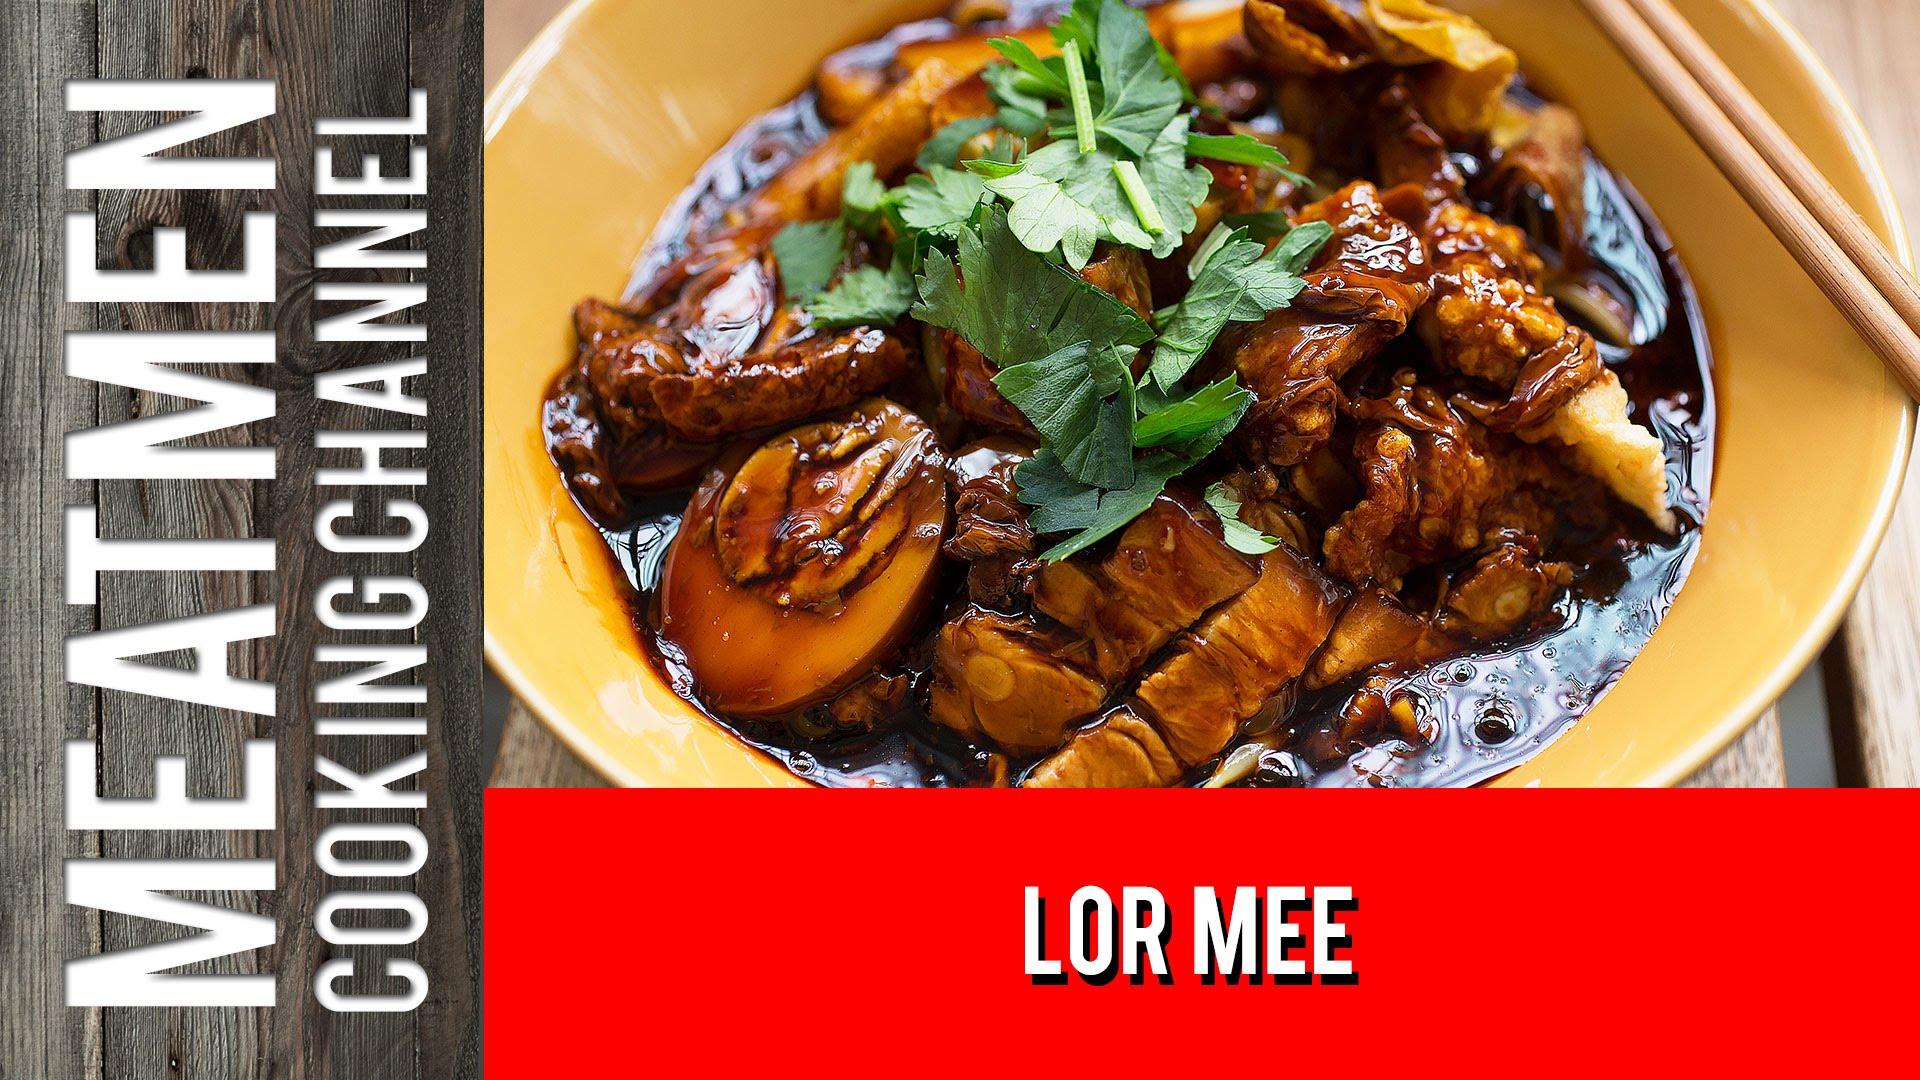 Lor Mee - 卤面 - YouTube